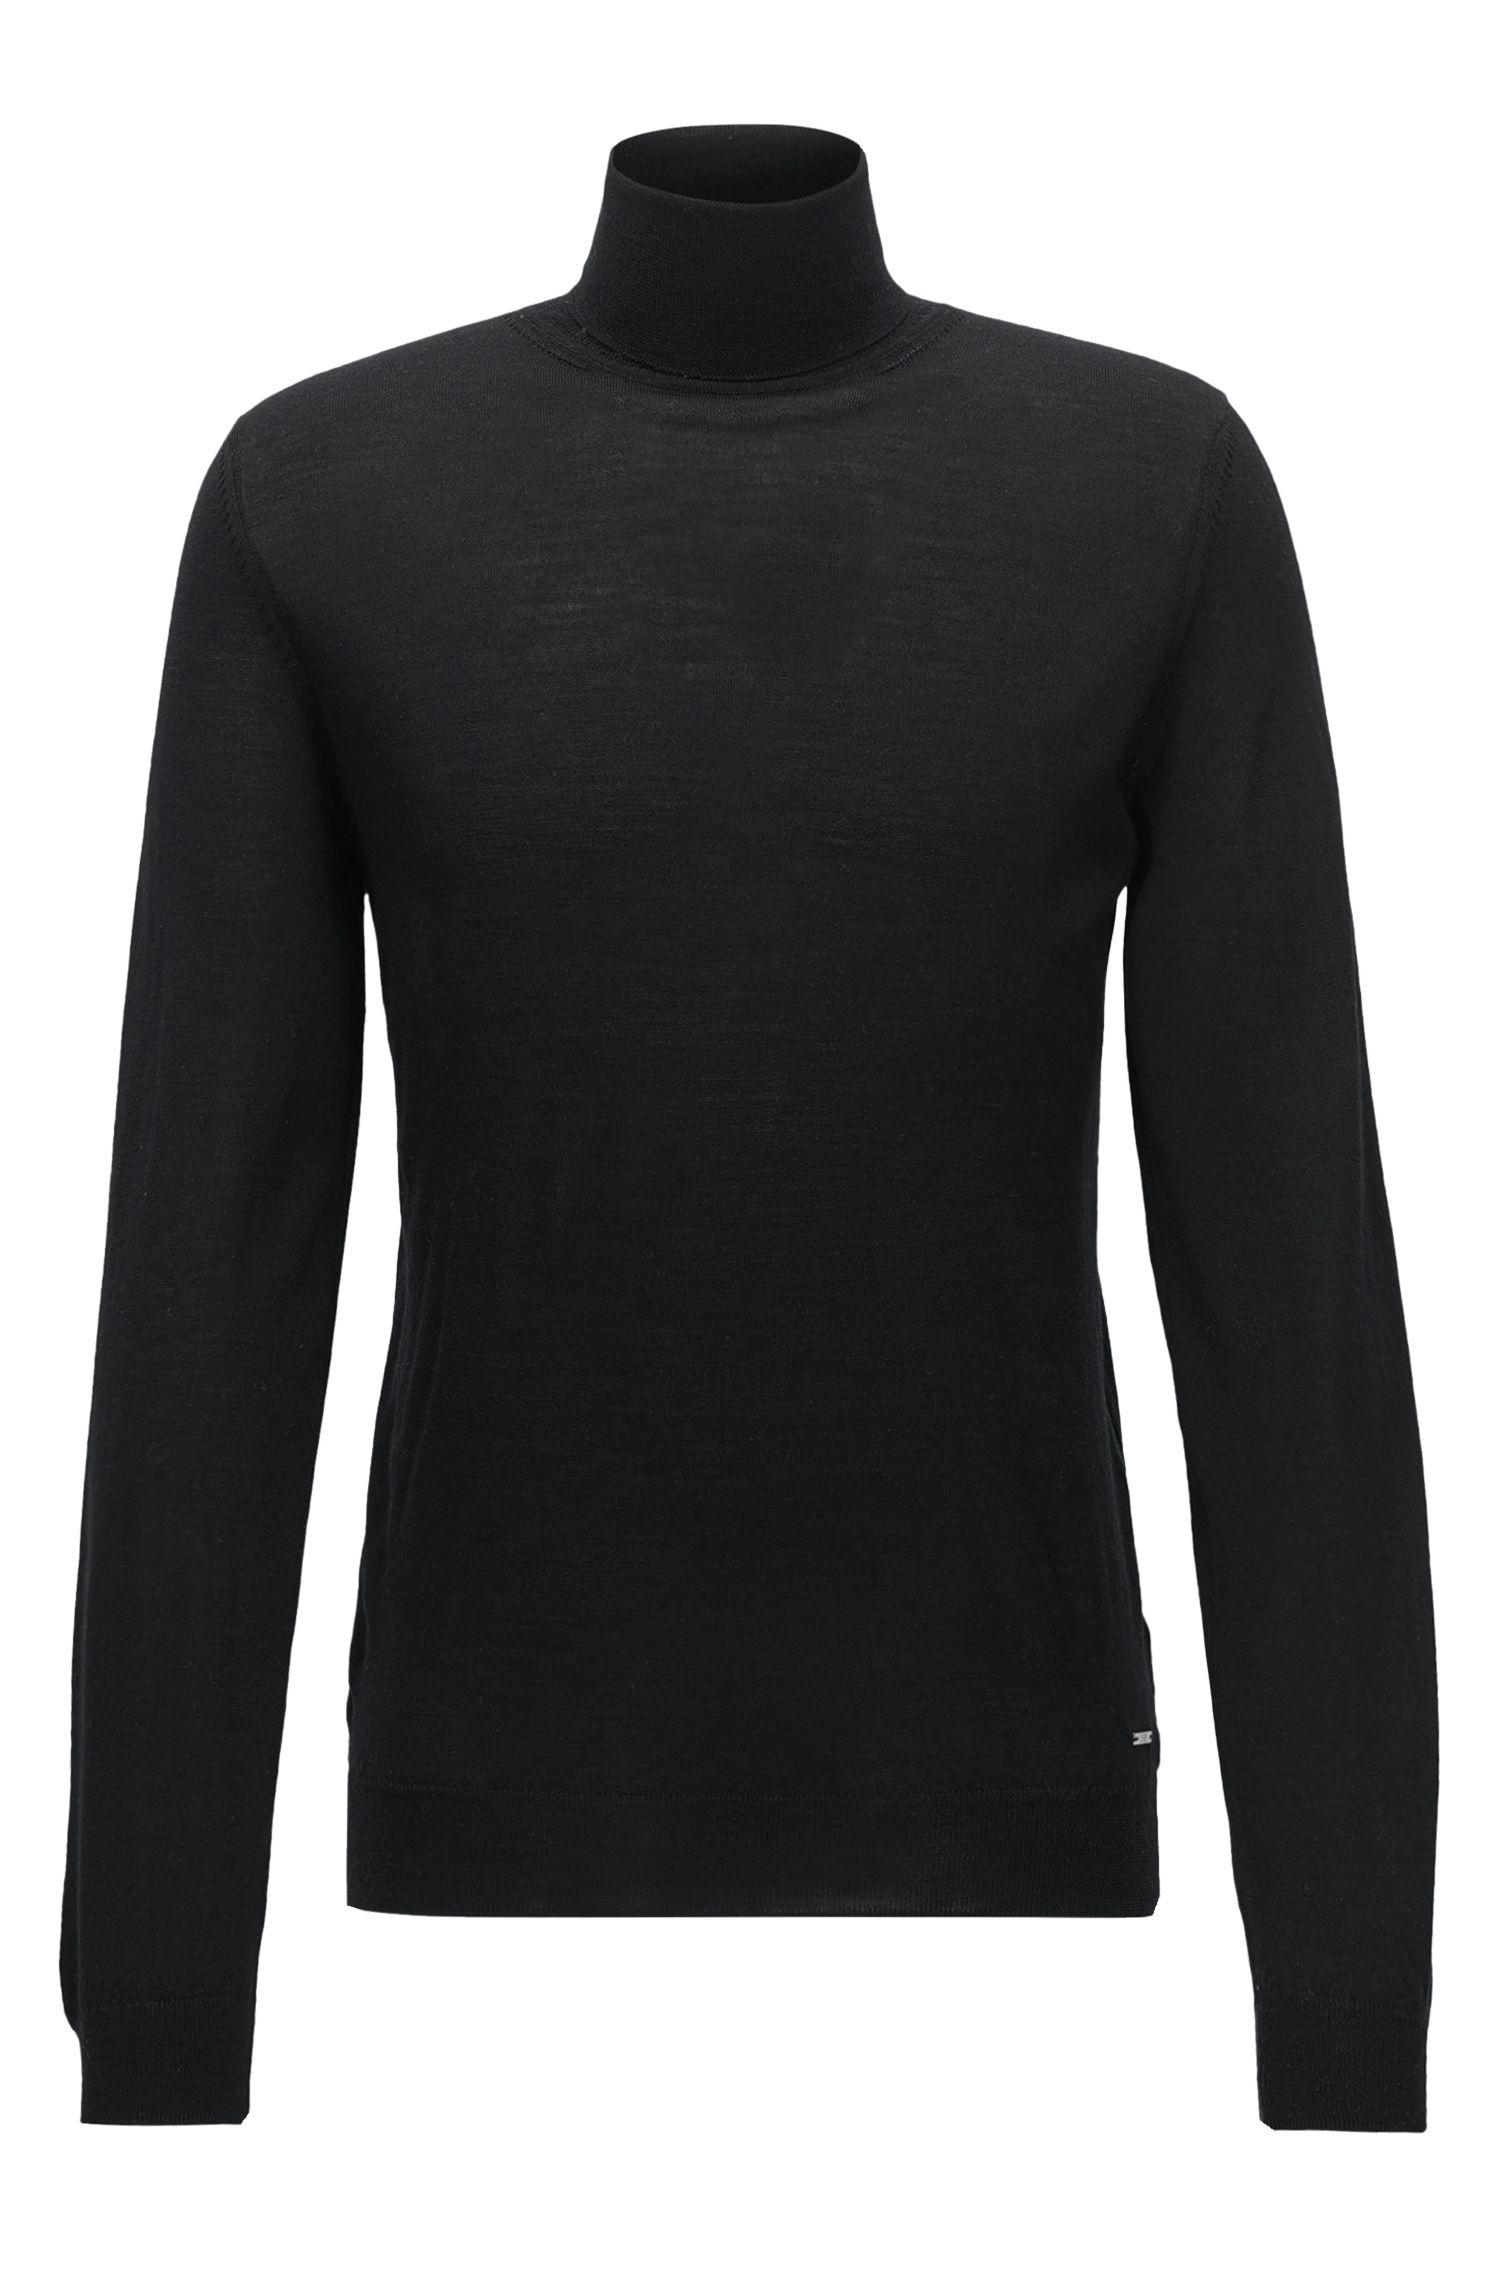 Virgin Wool Silk Turtleneck Sweater | T-Pinello, Black